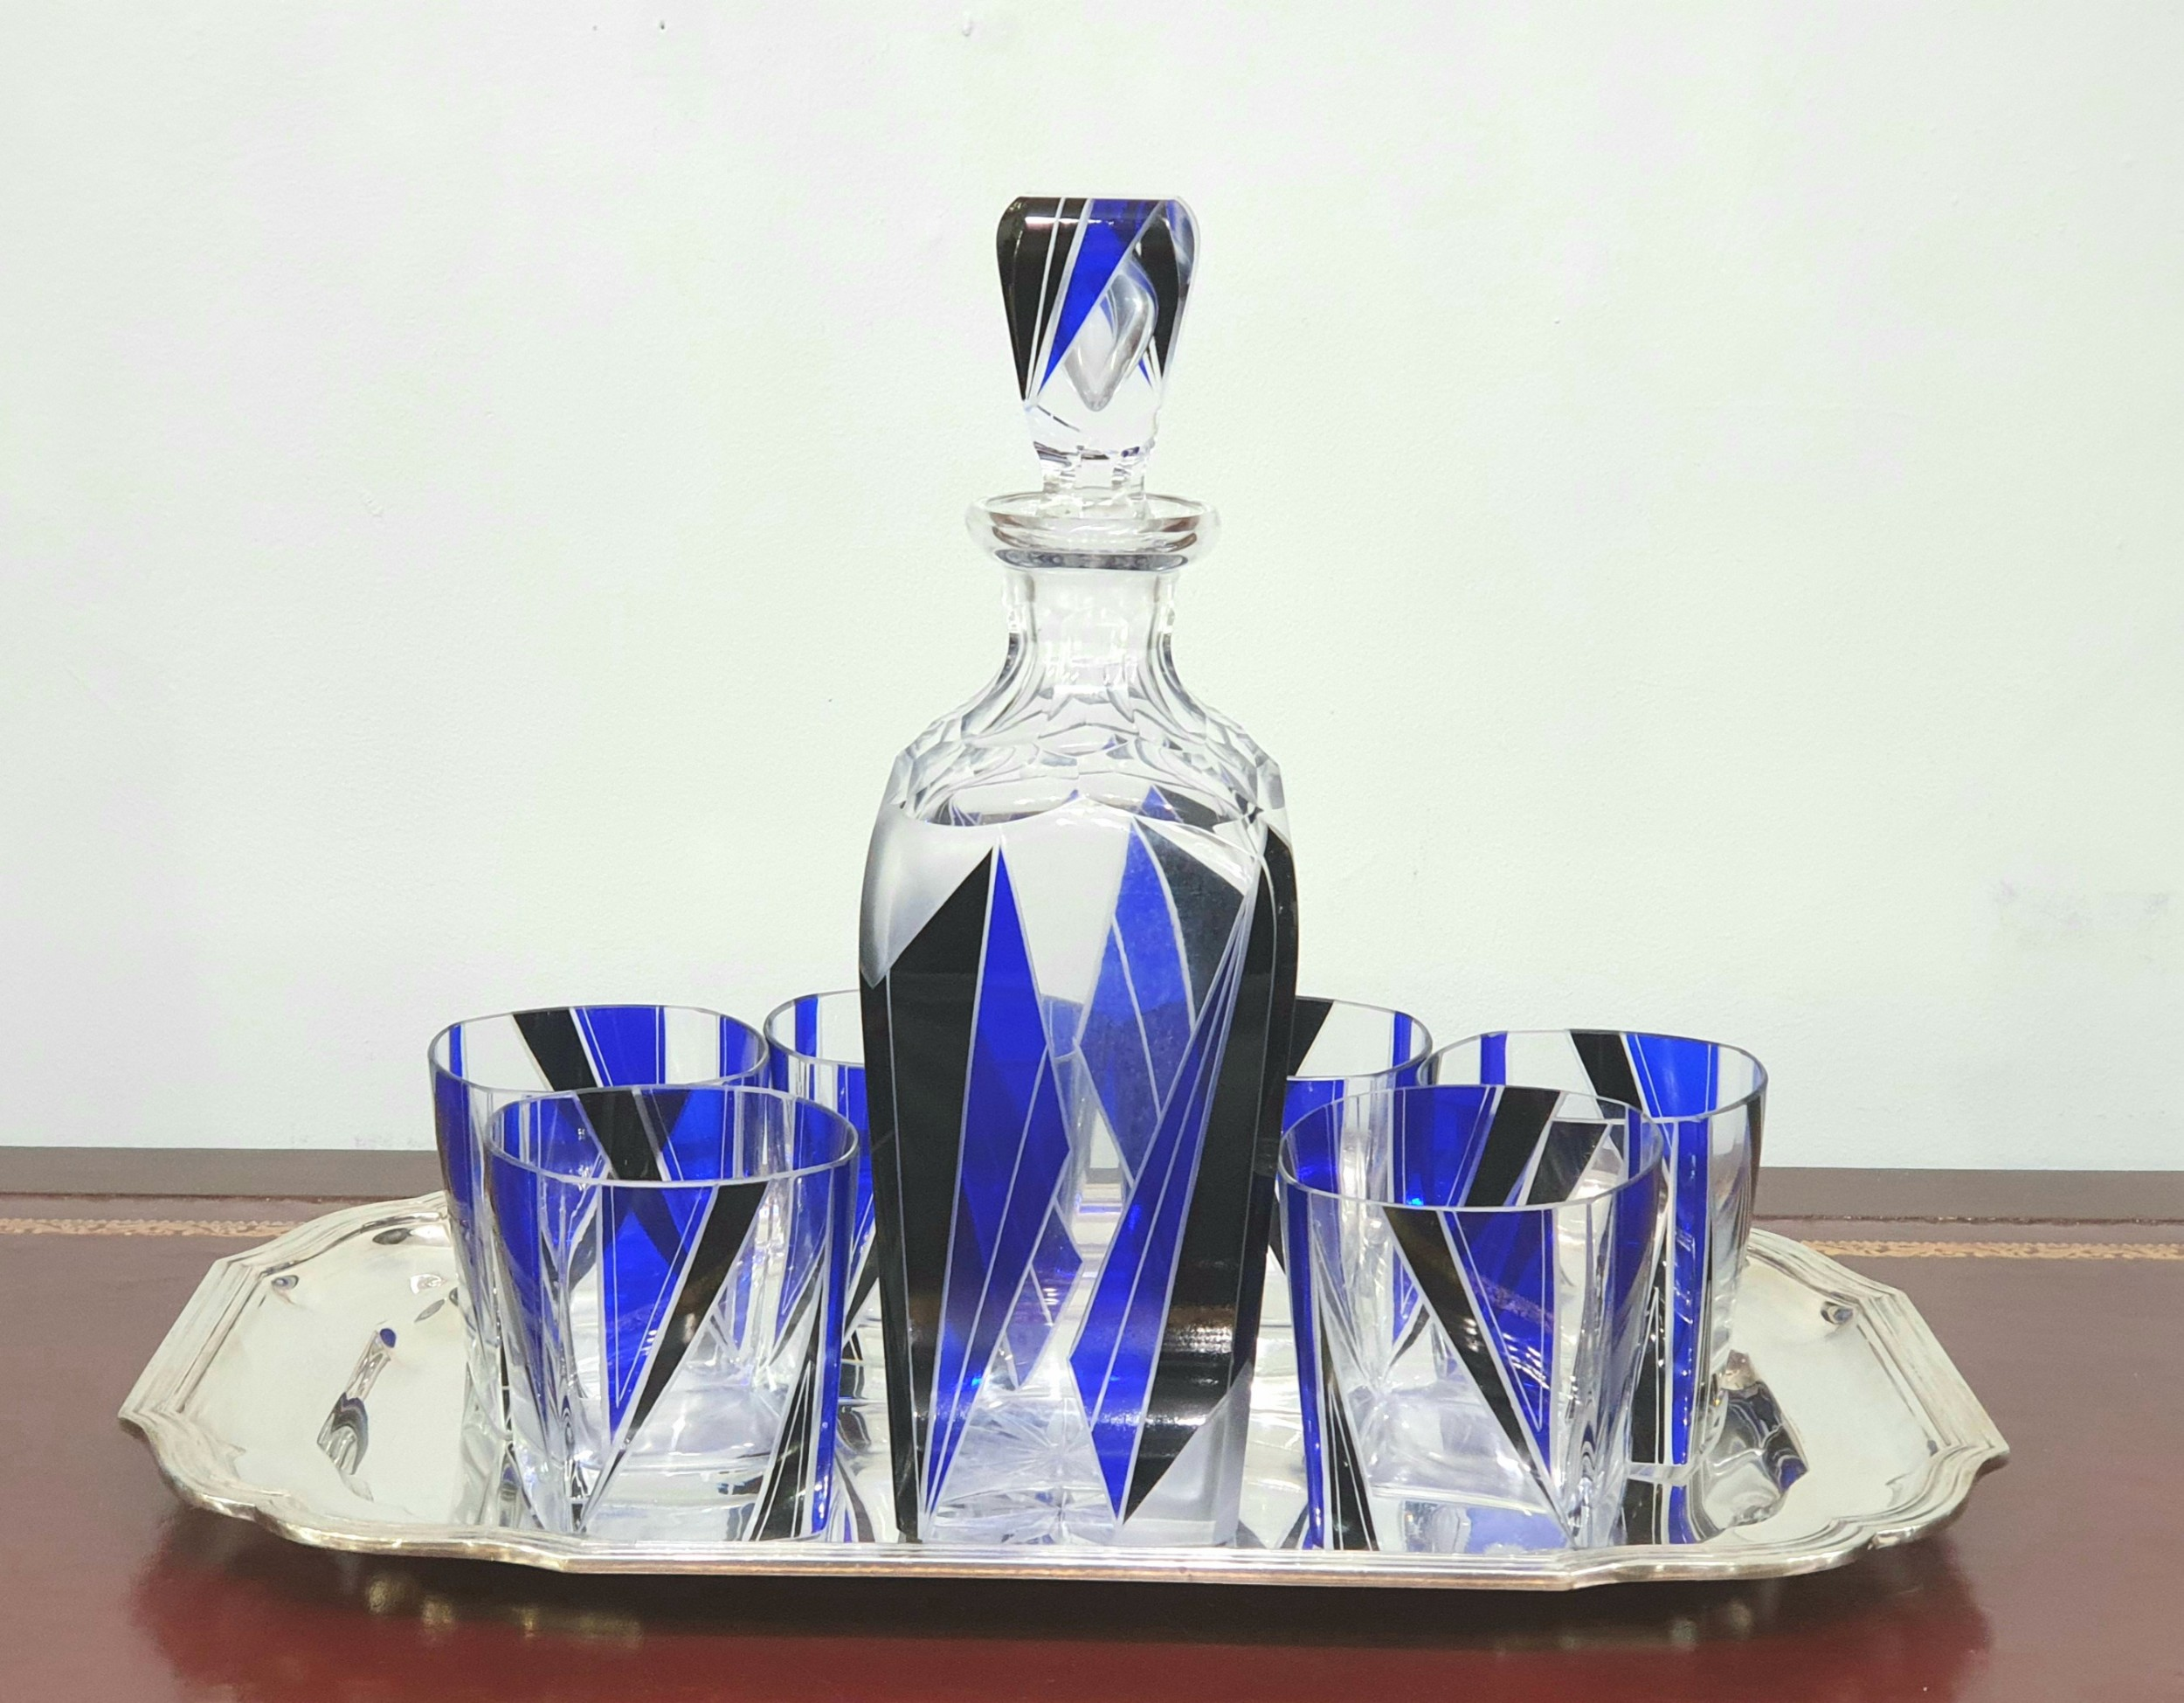 karl palda orginal bohemian art deco decanter set six drinking glasses c1930